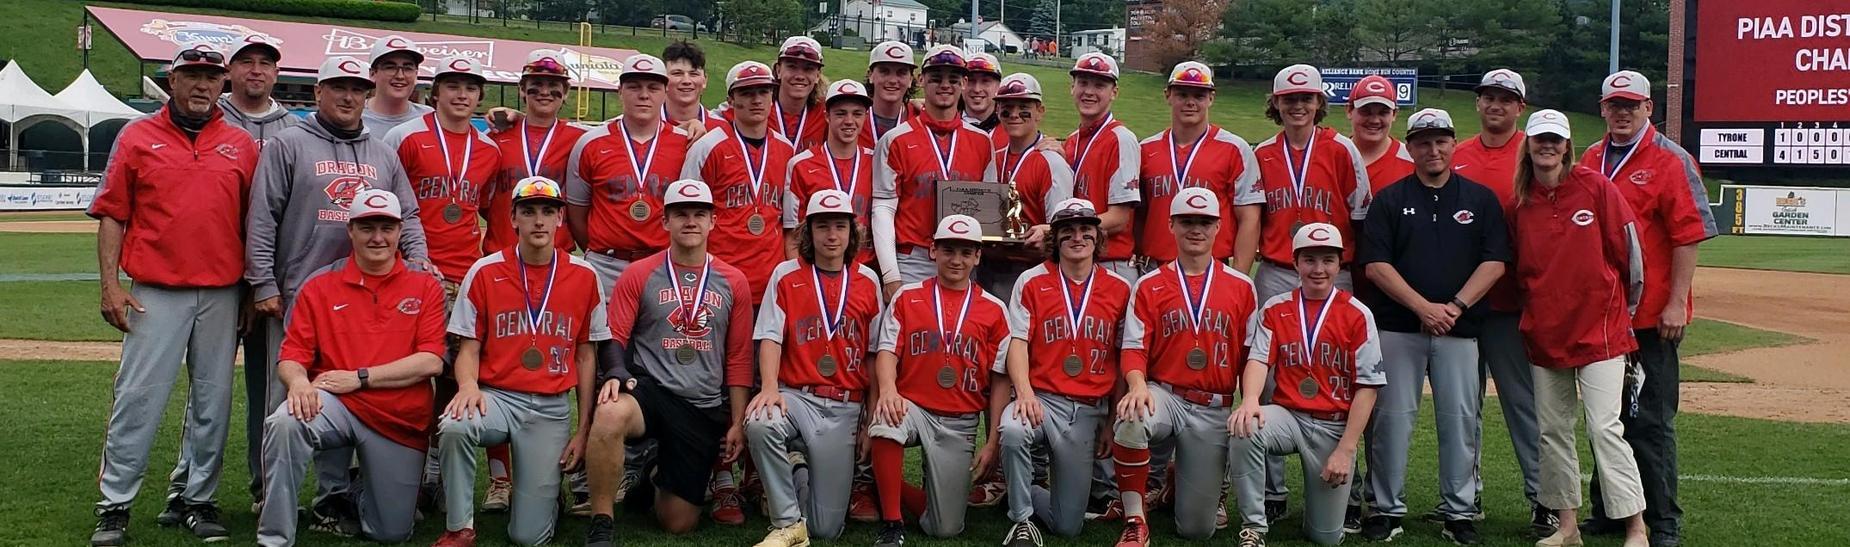 D6 3A Baseball Champions 2021